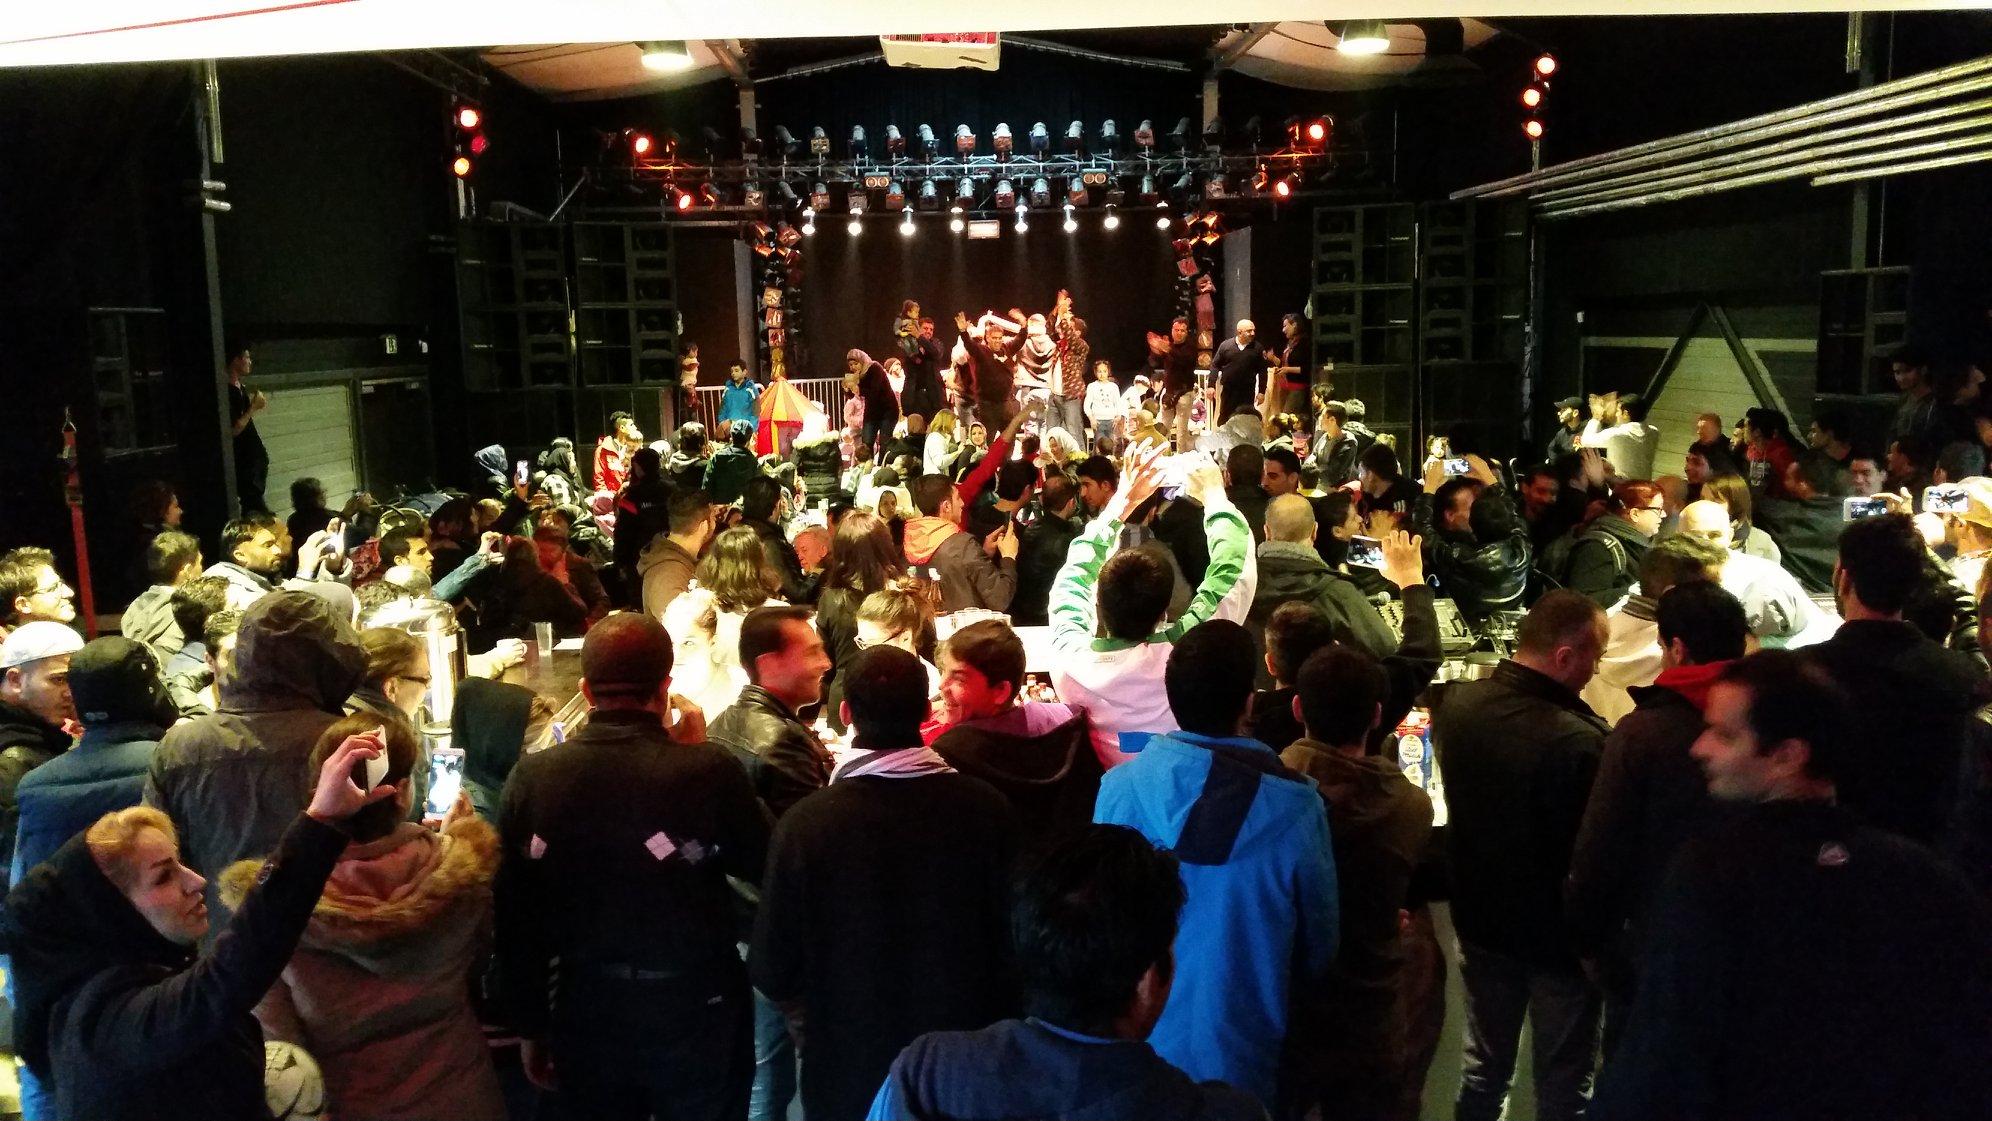 Willkommensfest - social events